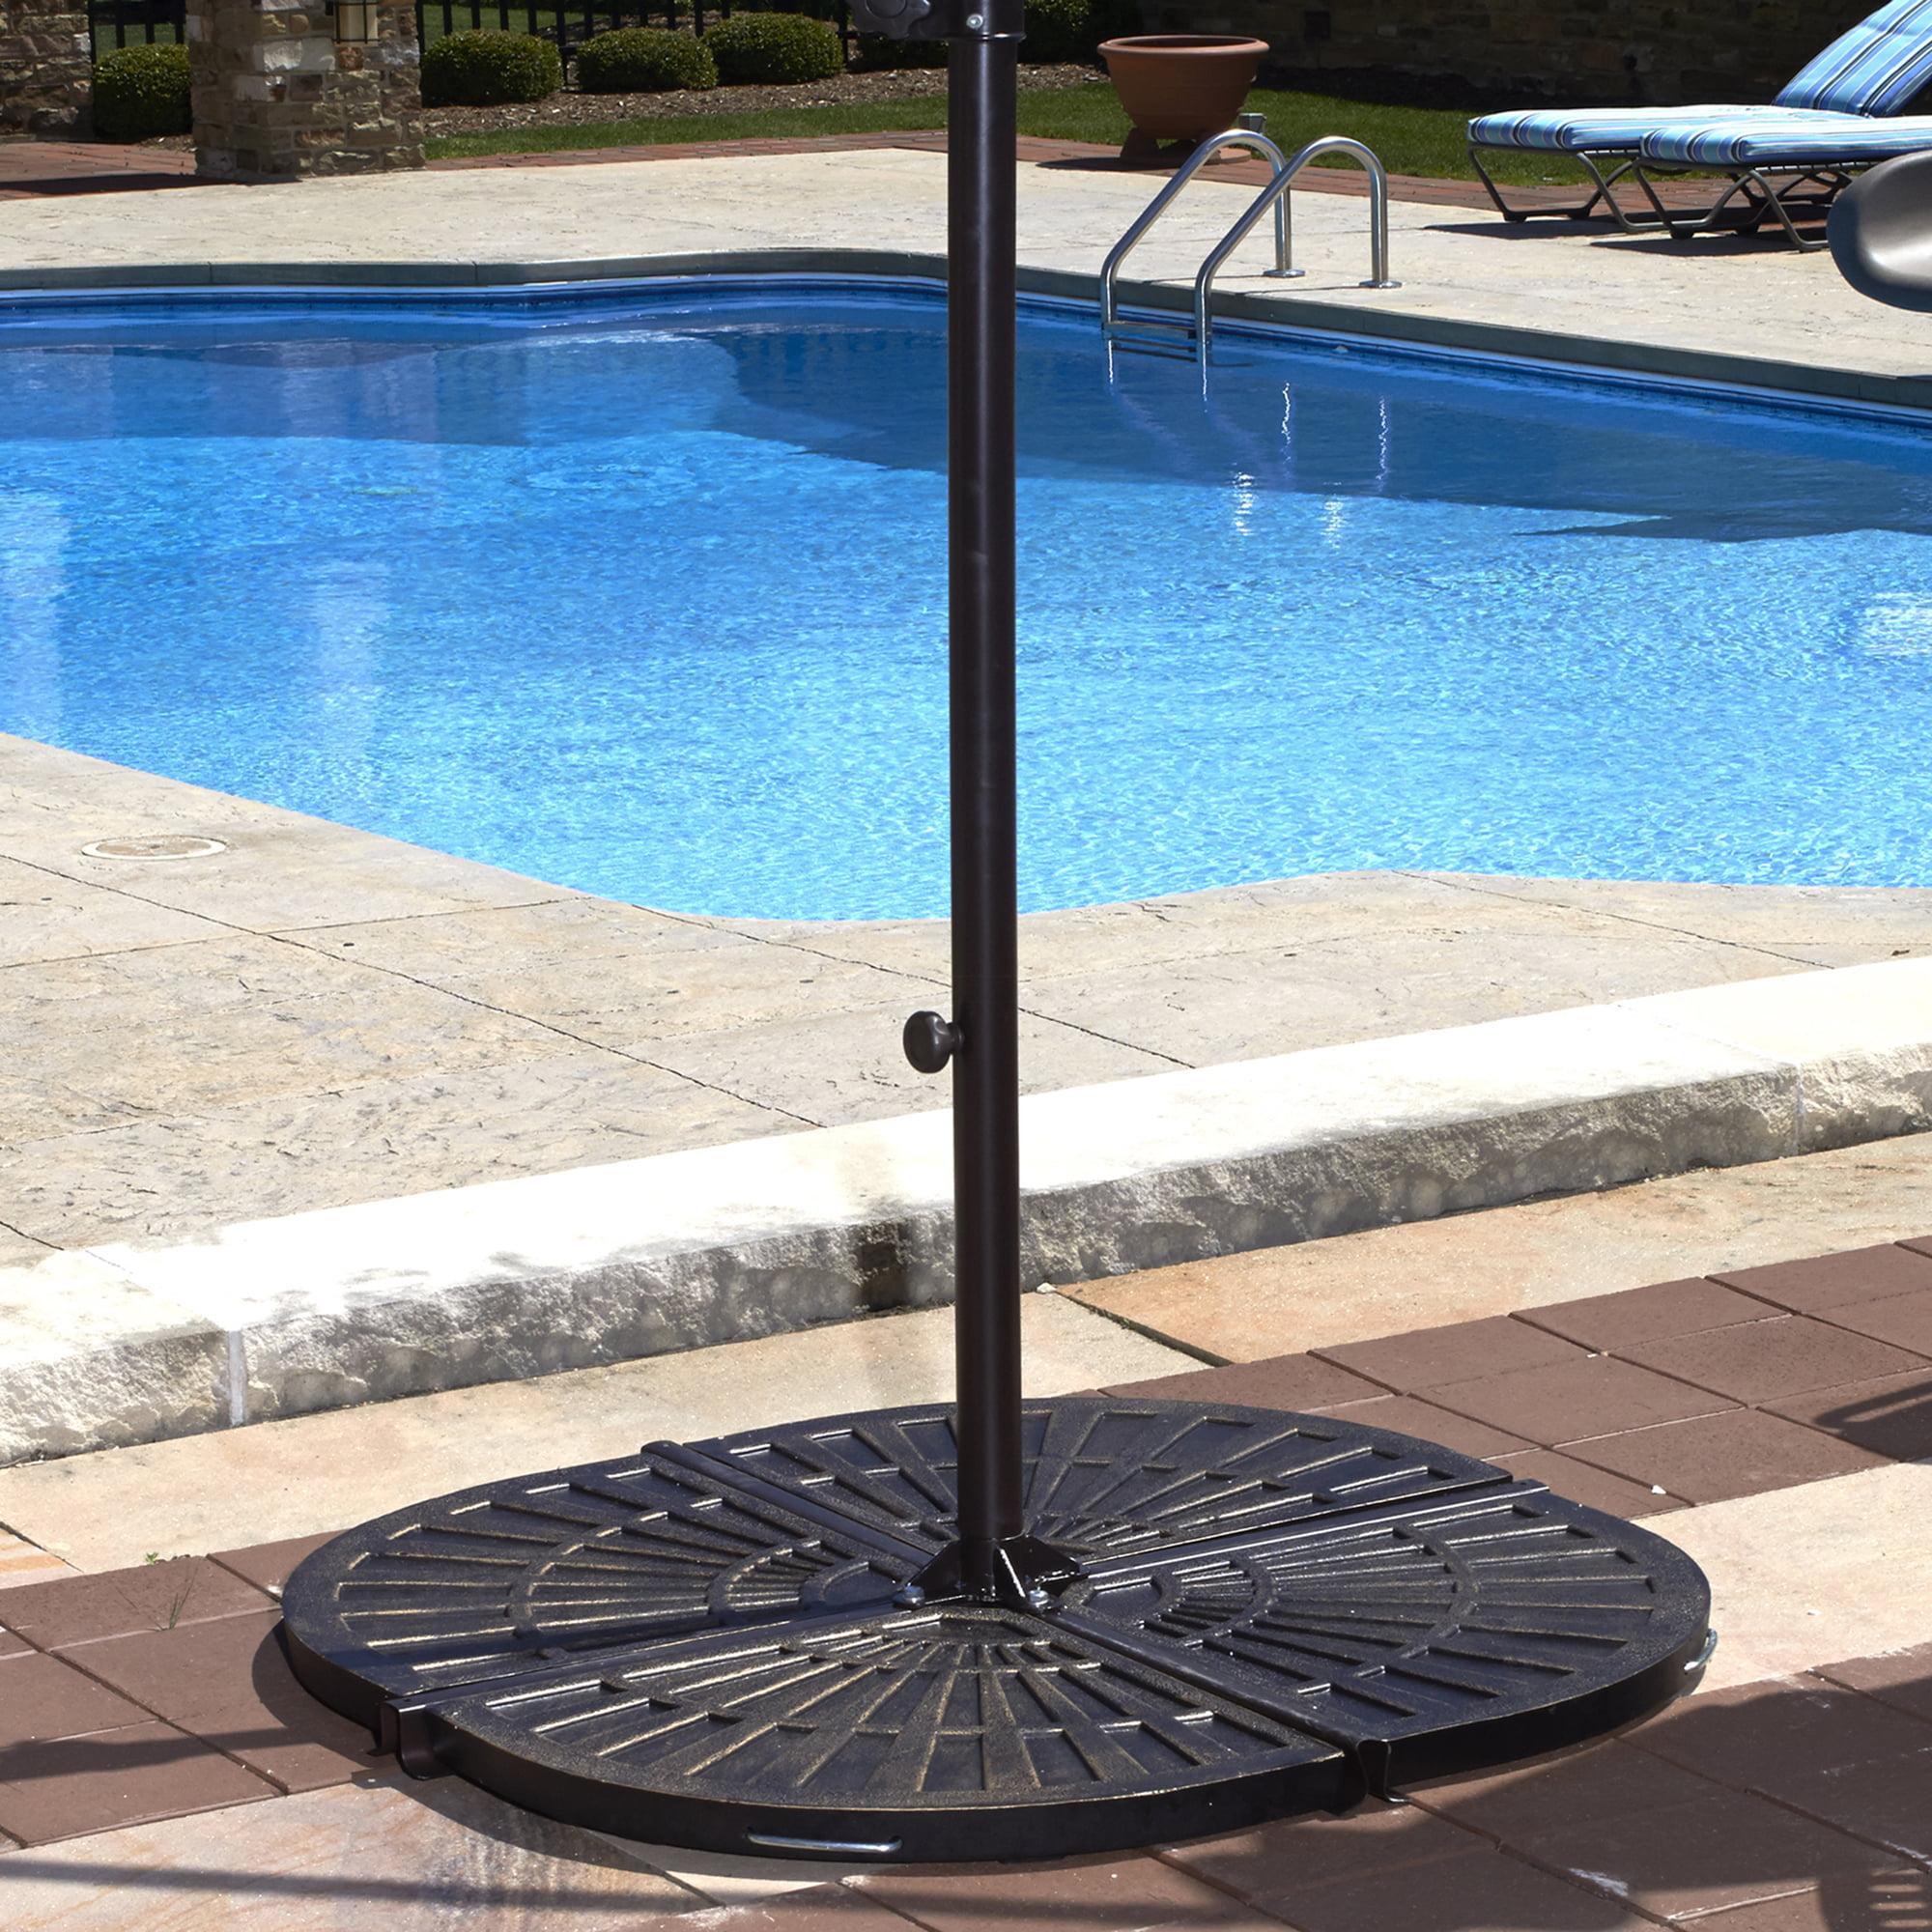 Island Umbrella (4) 30-lb Resin Umbrella Base Weights in Bronze by Resin Furniture